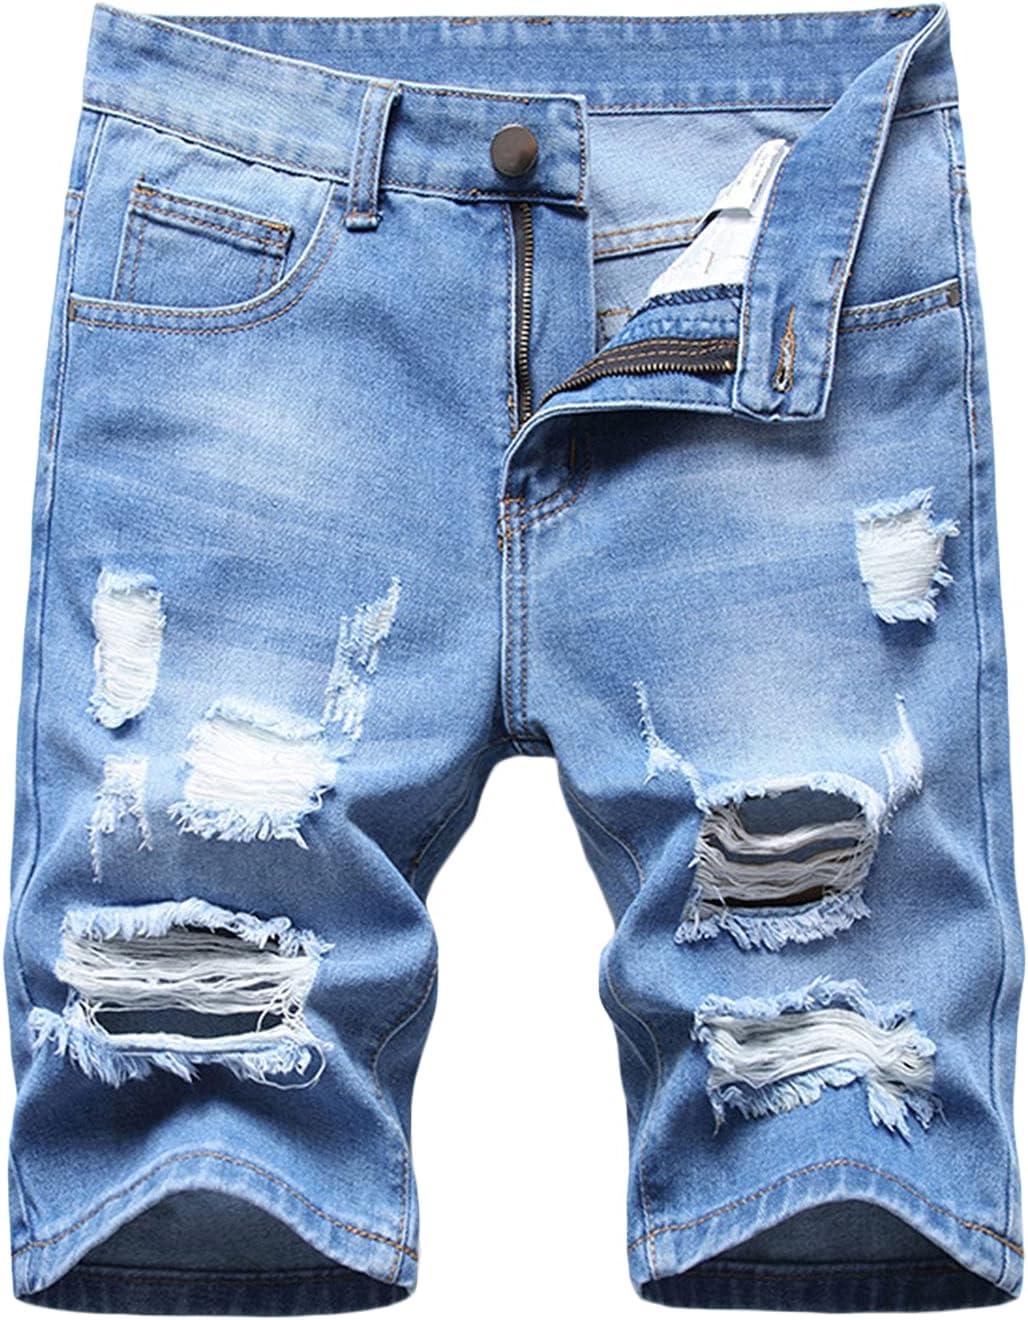 Men's Ripped Denim Shorts Washed Distressed Slim Jean Short Hole Vintage Stylish Knee Length Straight Jeans Short (Light Blue,28)